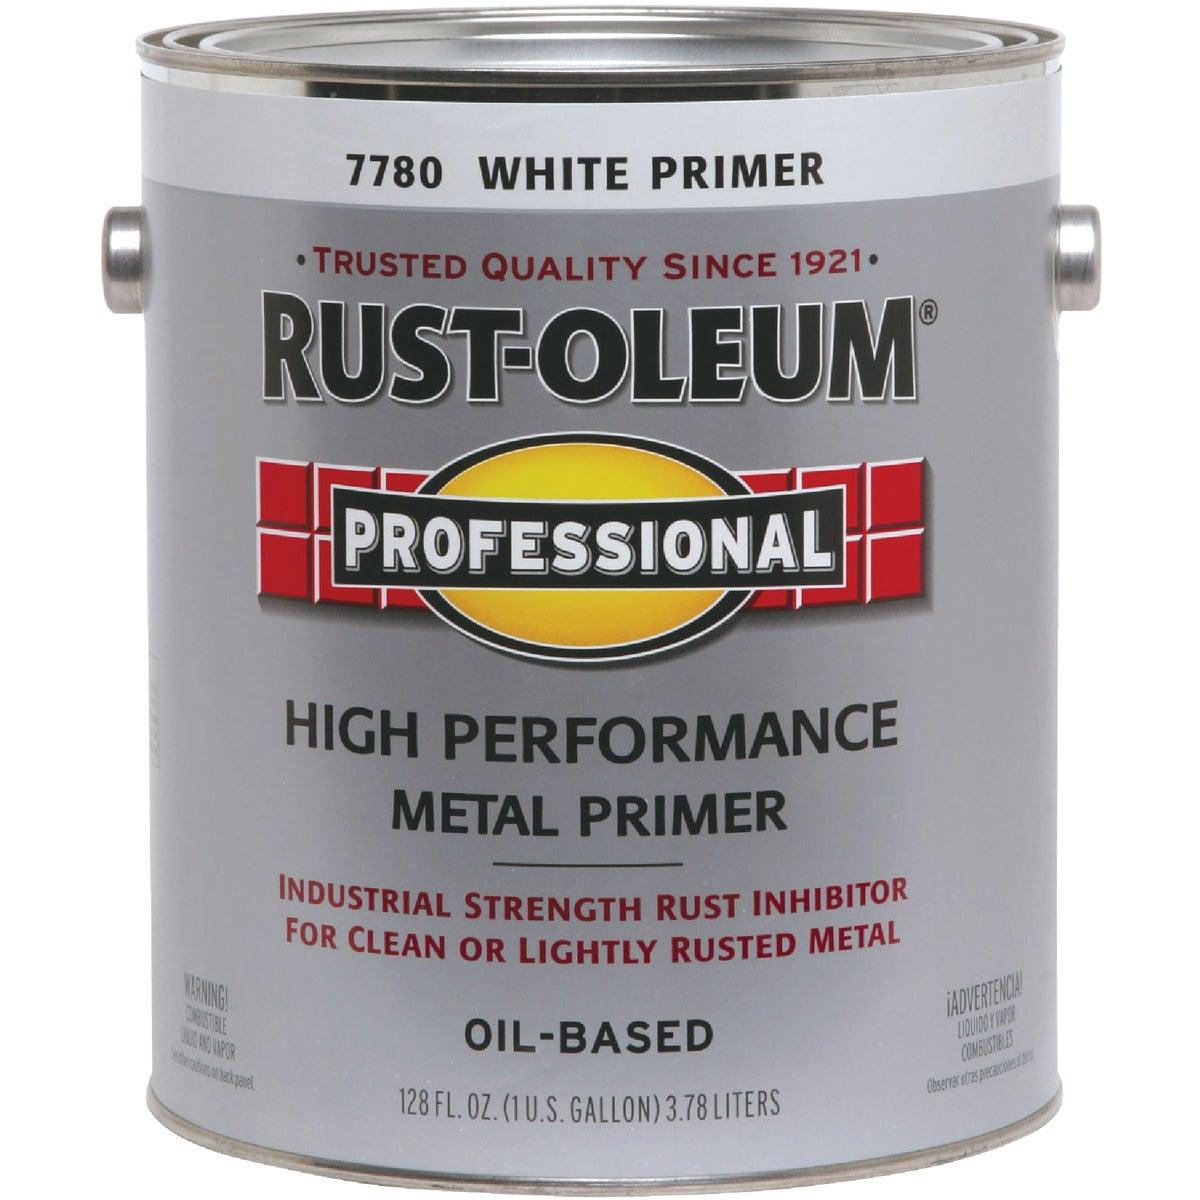 WHITE CLEAN METAL PRIMER - 7780-402 by Rustoleum